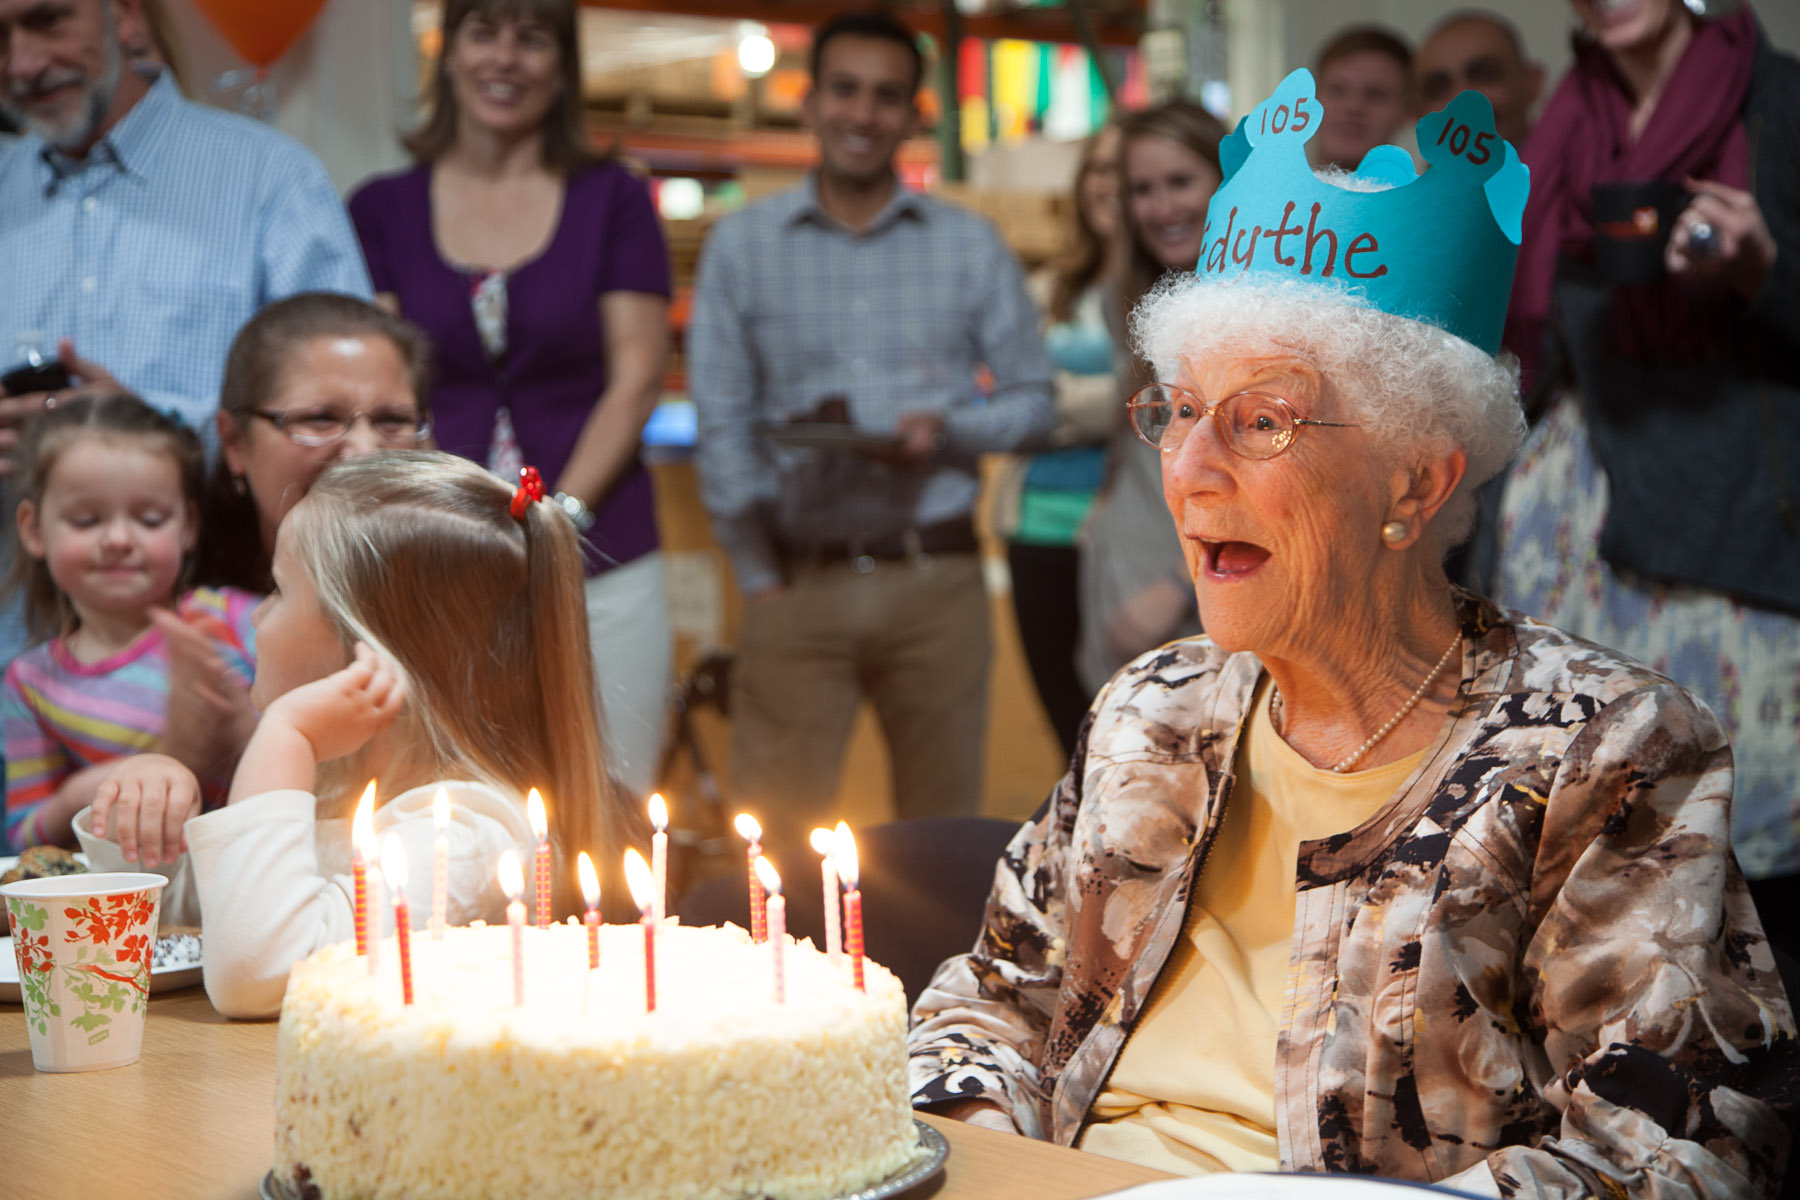 Edythe Kirchmaier's 105th Birthday Celebration. Direct Relief International. Goleta, California. January 22, 2013. Photo: ©IsaacHernandez.com